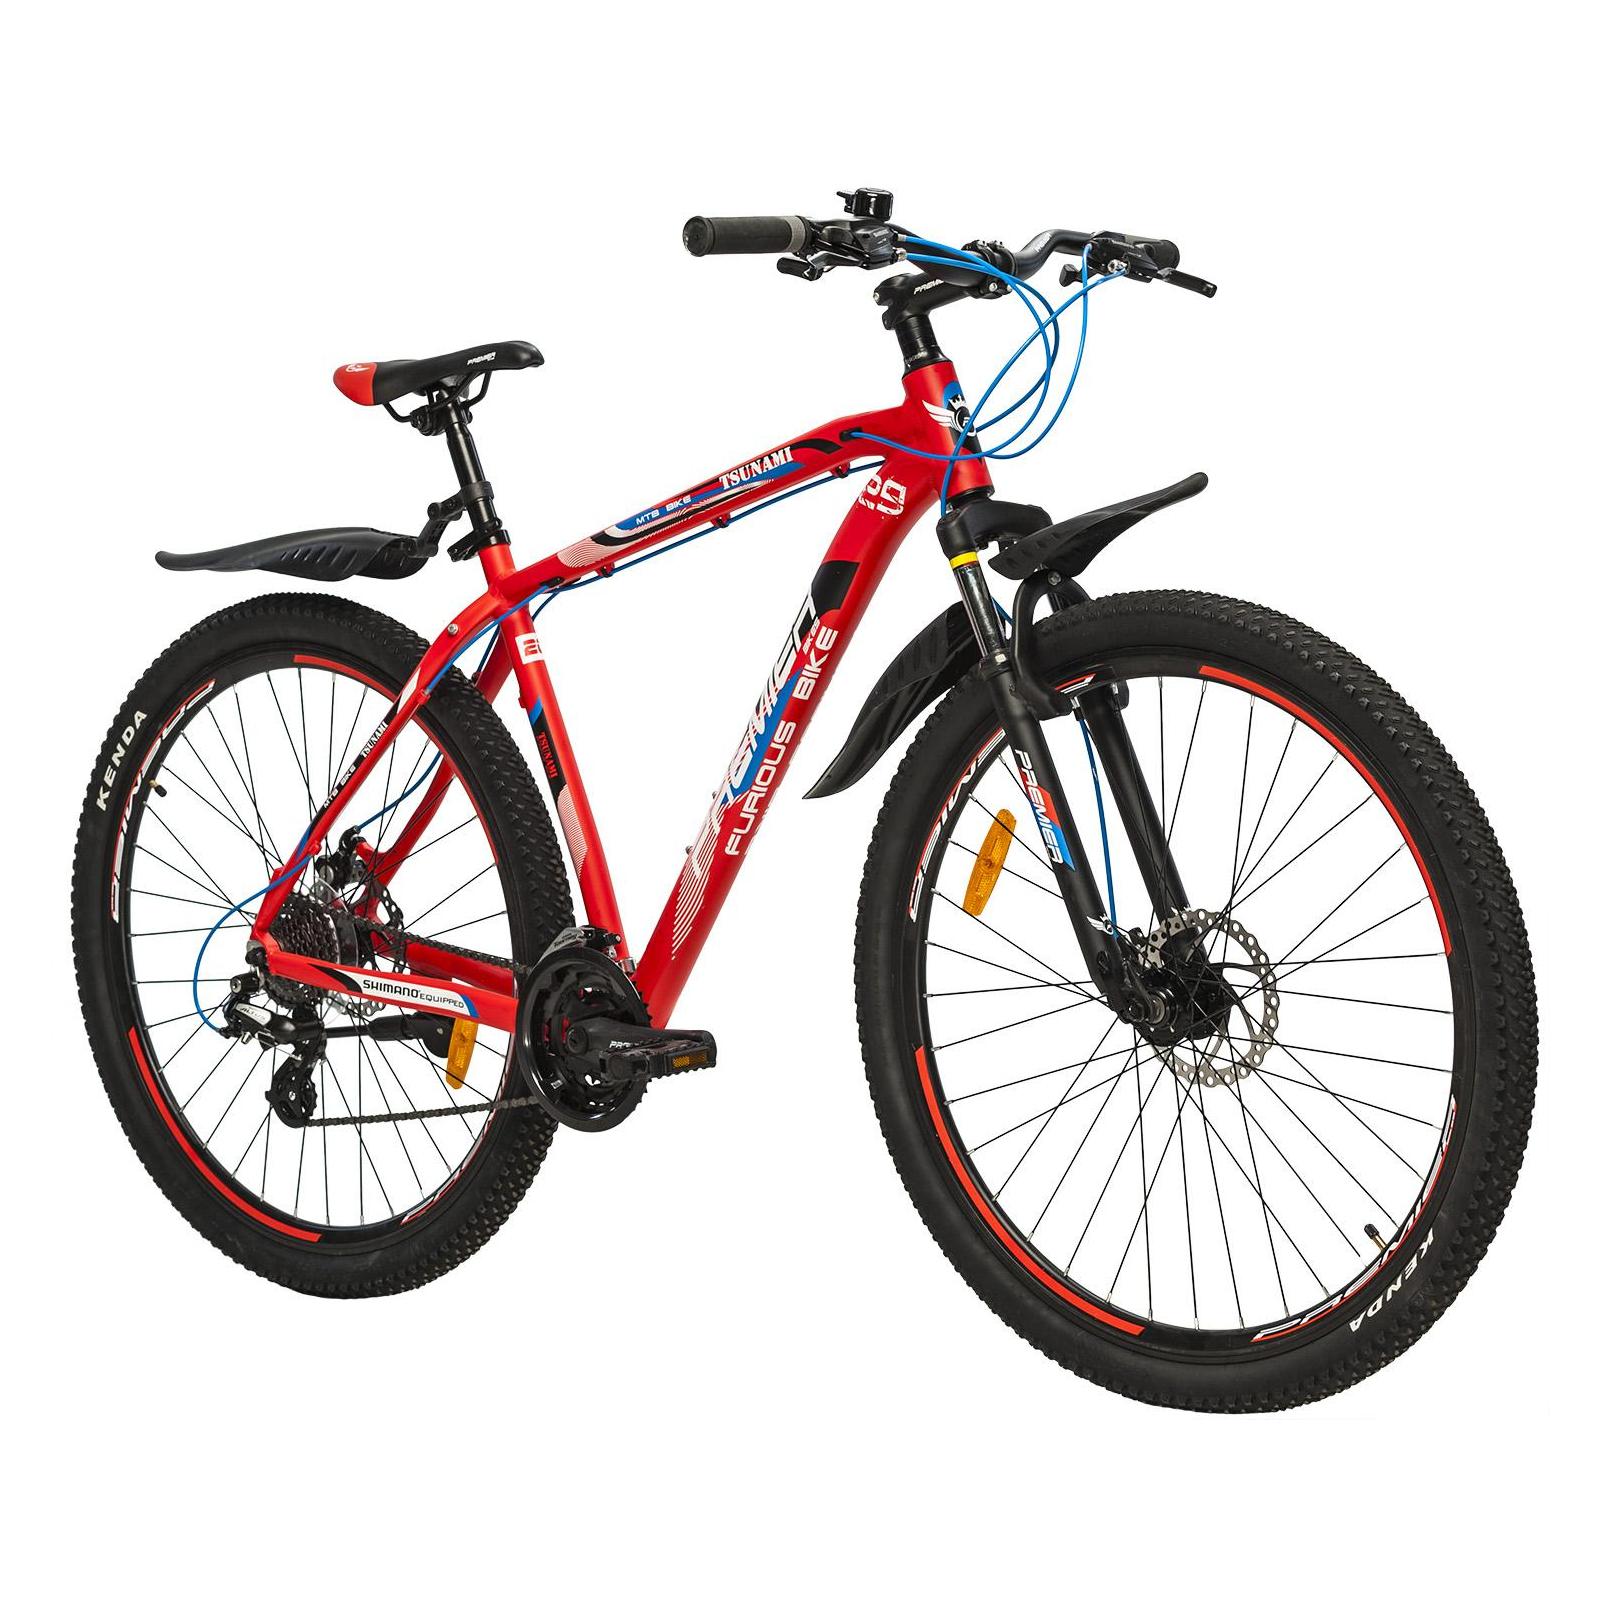 "Велосипед Premier Tsunami 29 Disc 17"" matt white (SP0001503) изображение 2"